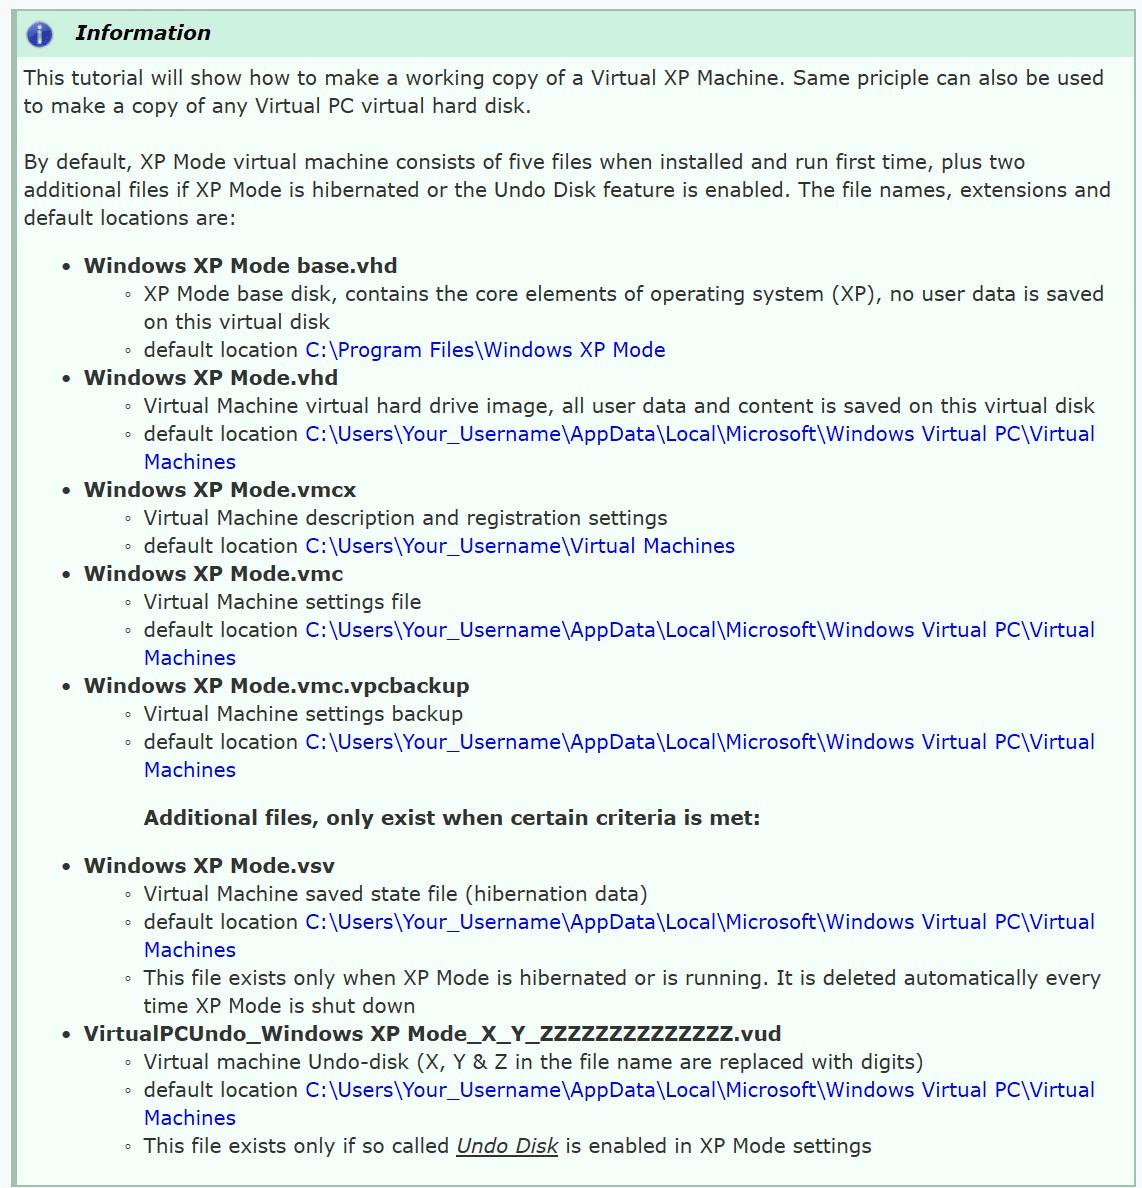 Import Windows XP Mode from Windows 7 to Windows 10   Tutorials